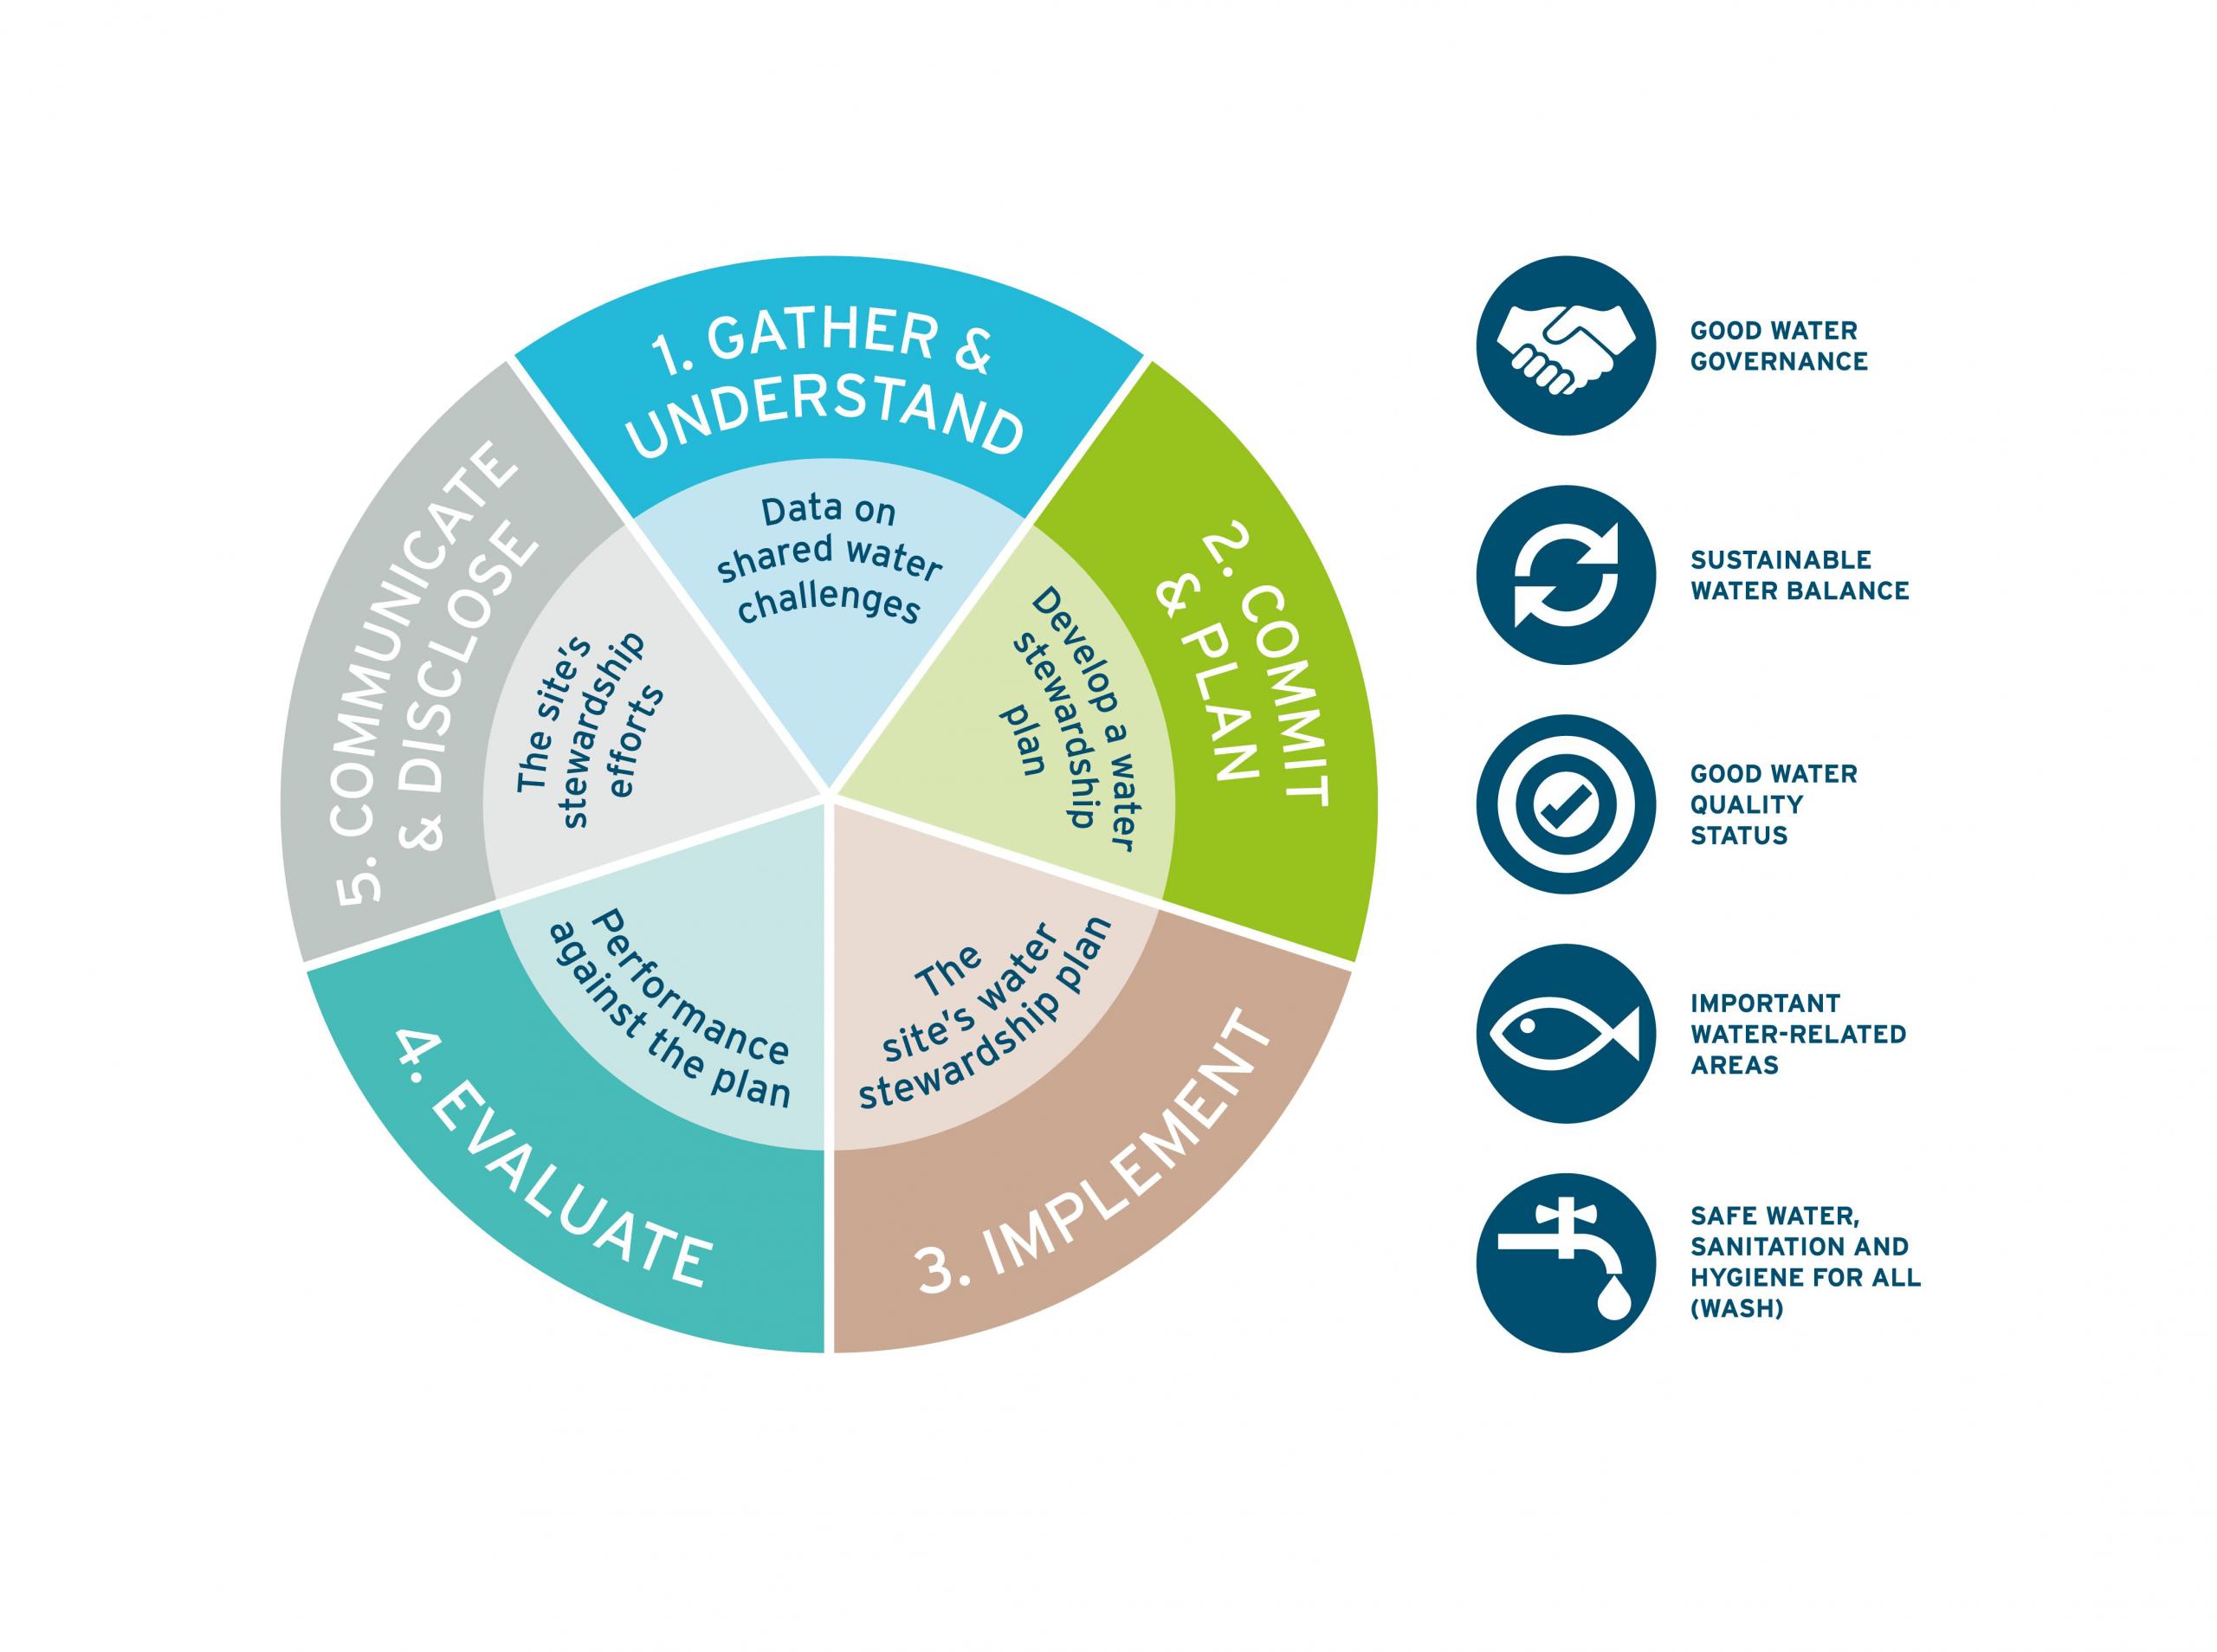 Alliance for Water Stewardship (AWS) Standard